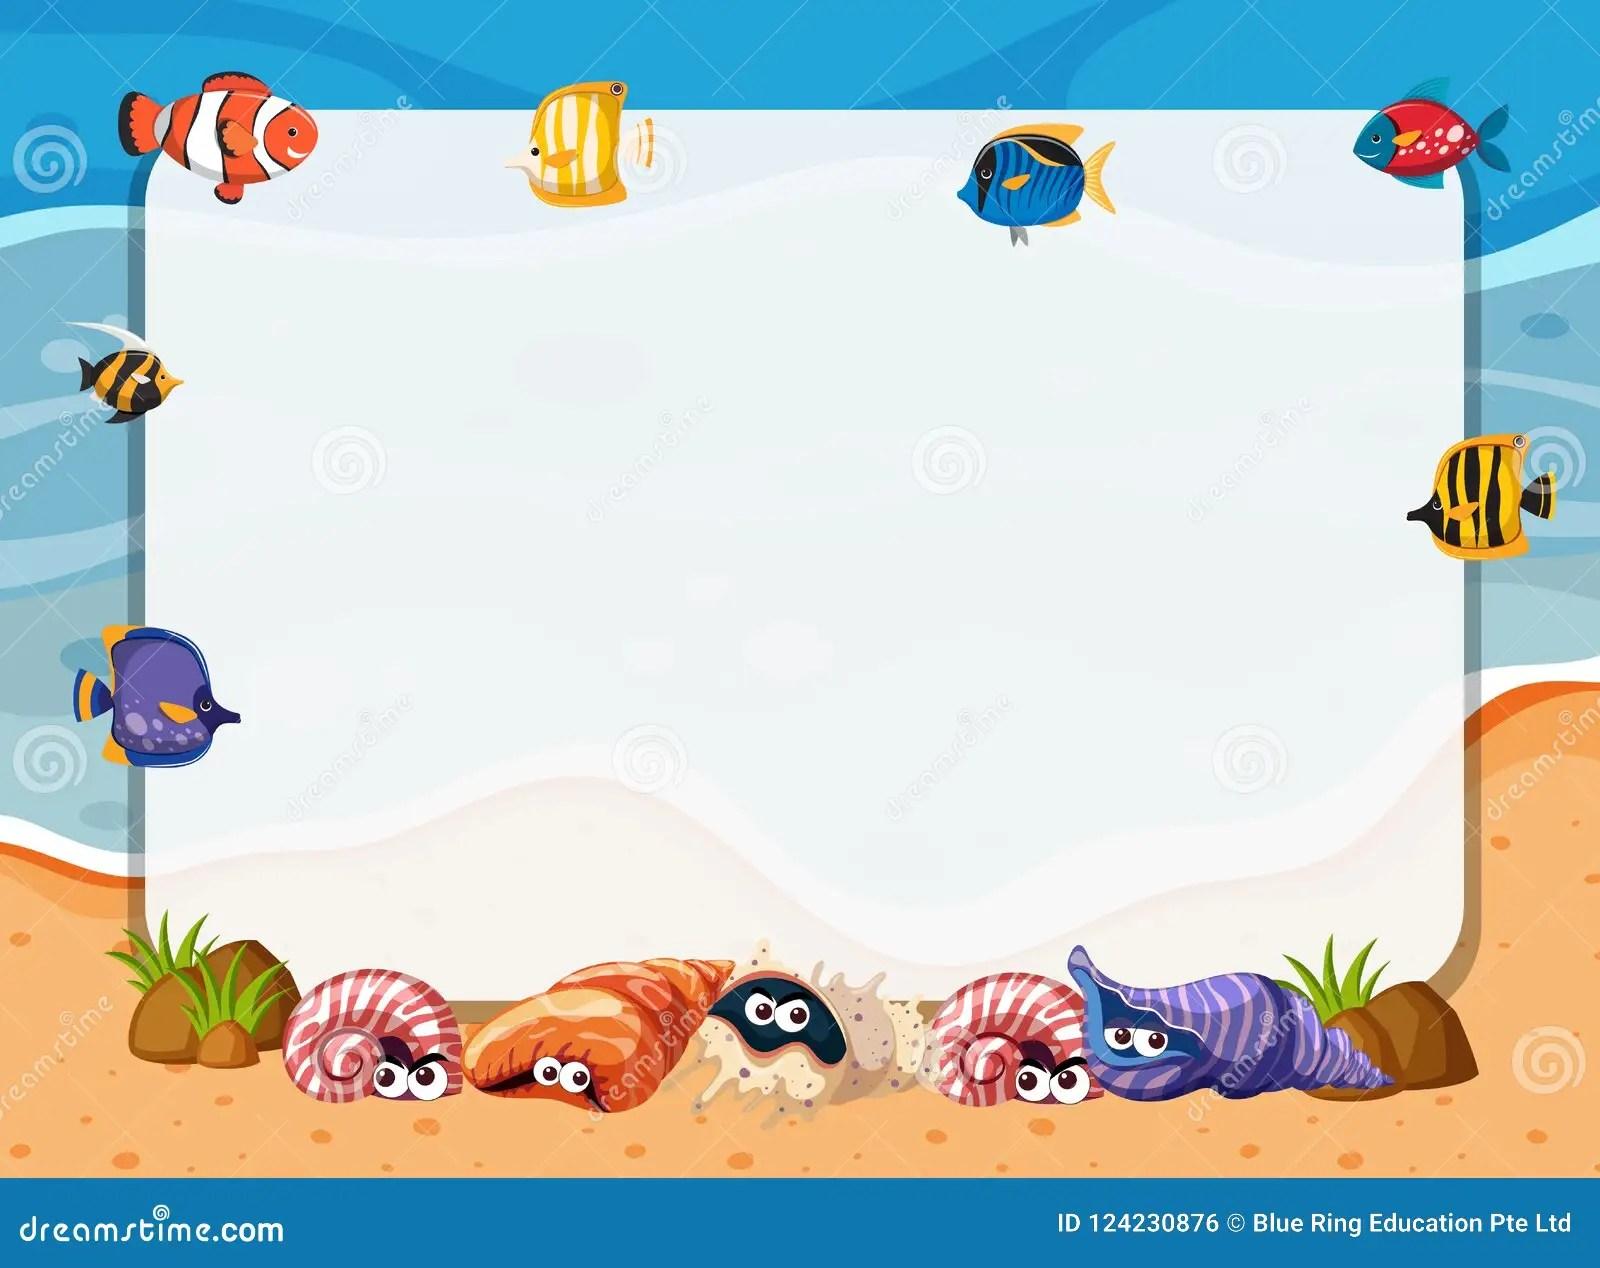 Sea Creatures Frame Stock Illustrations 211 Sea Creatures Frame Stock Illustrations Vectors